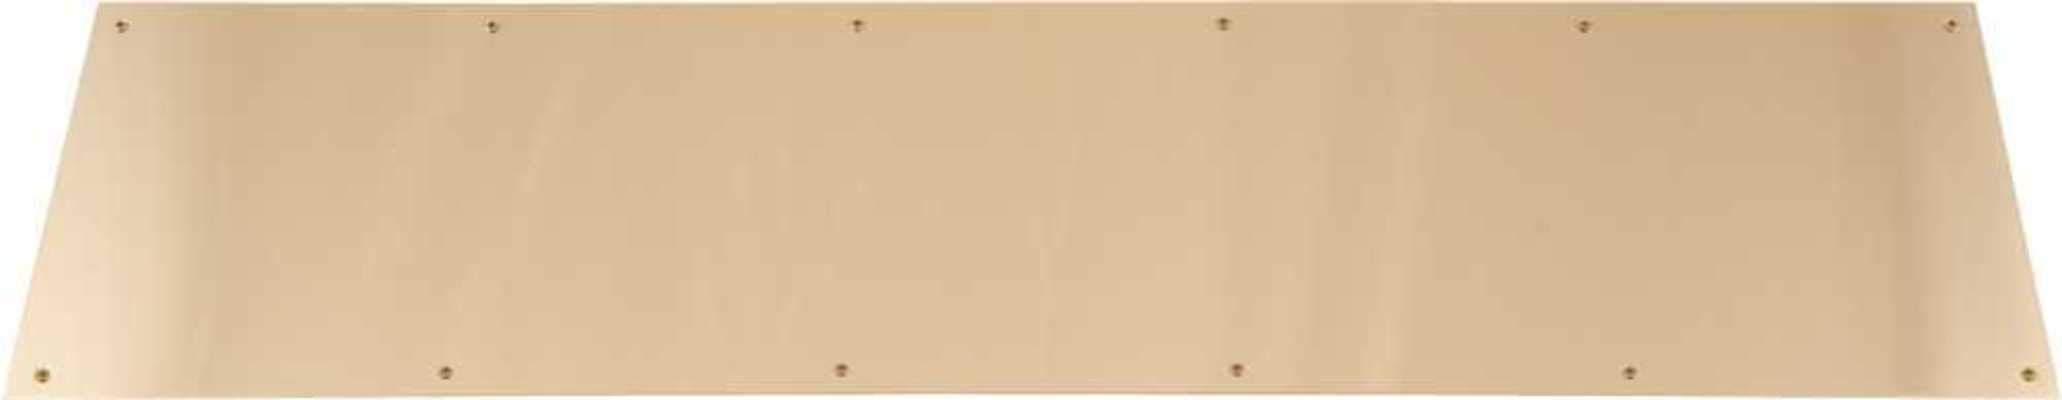 Don-Jo 6 X 36 605 KICK PLATE 6 IN. X 36 IN, SOLID BRASS